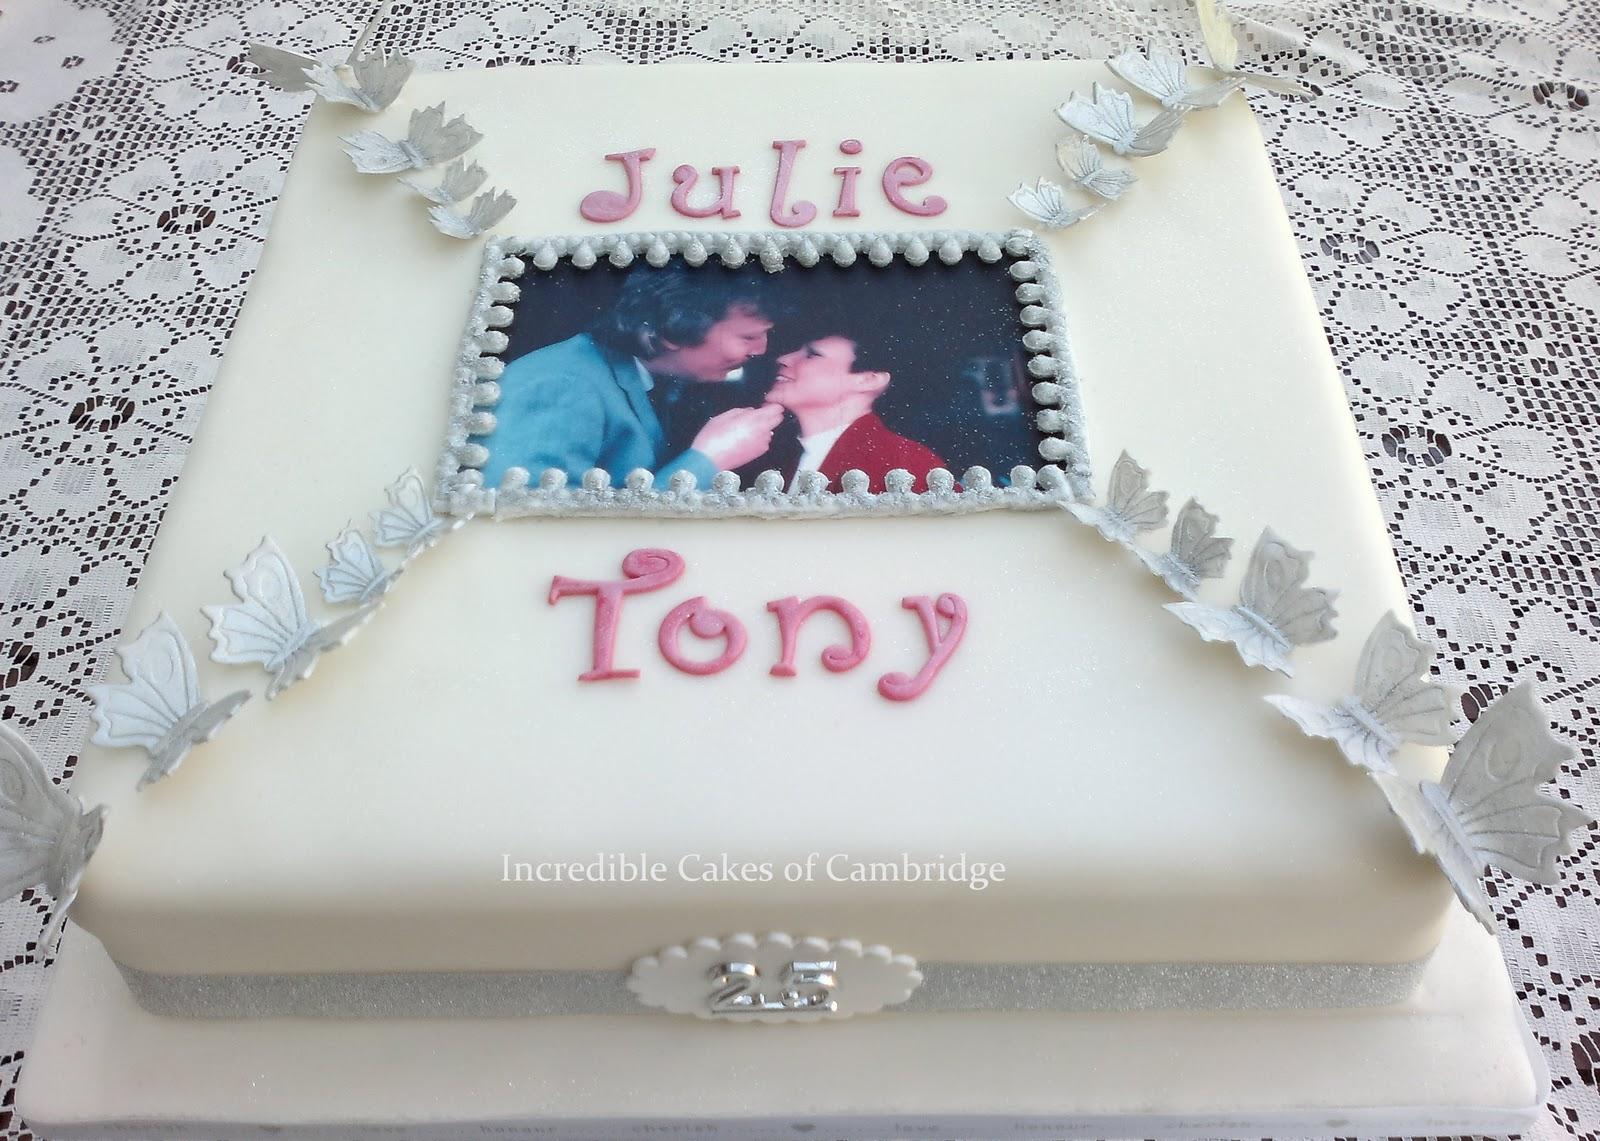 Magnificent Wedding Anniversary Cake Designs Image - The Wedding ...